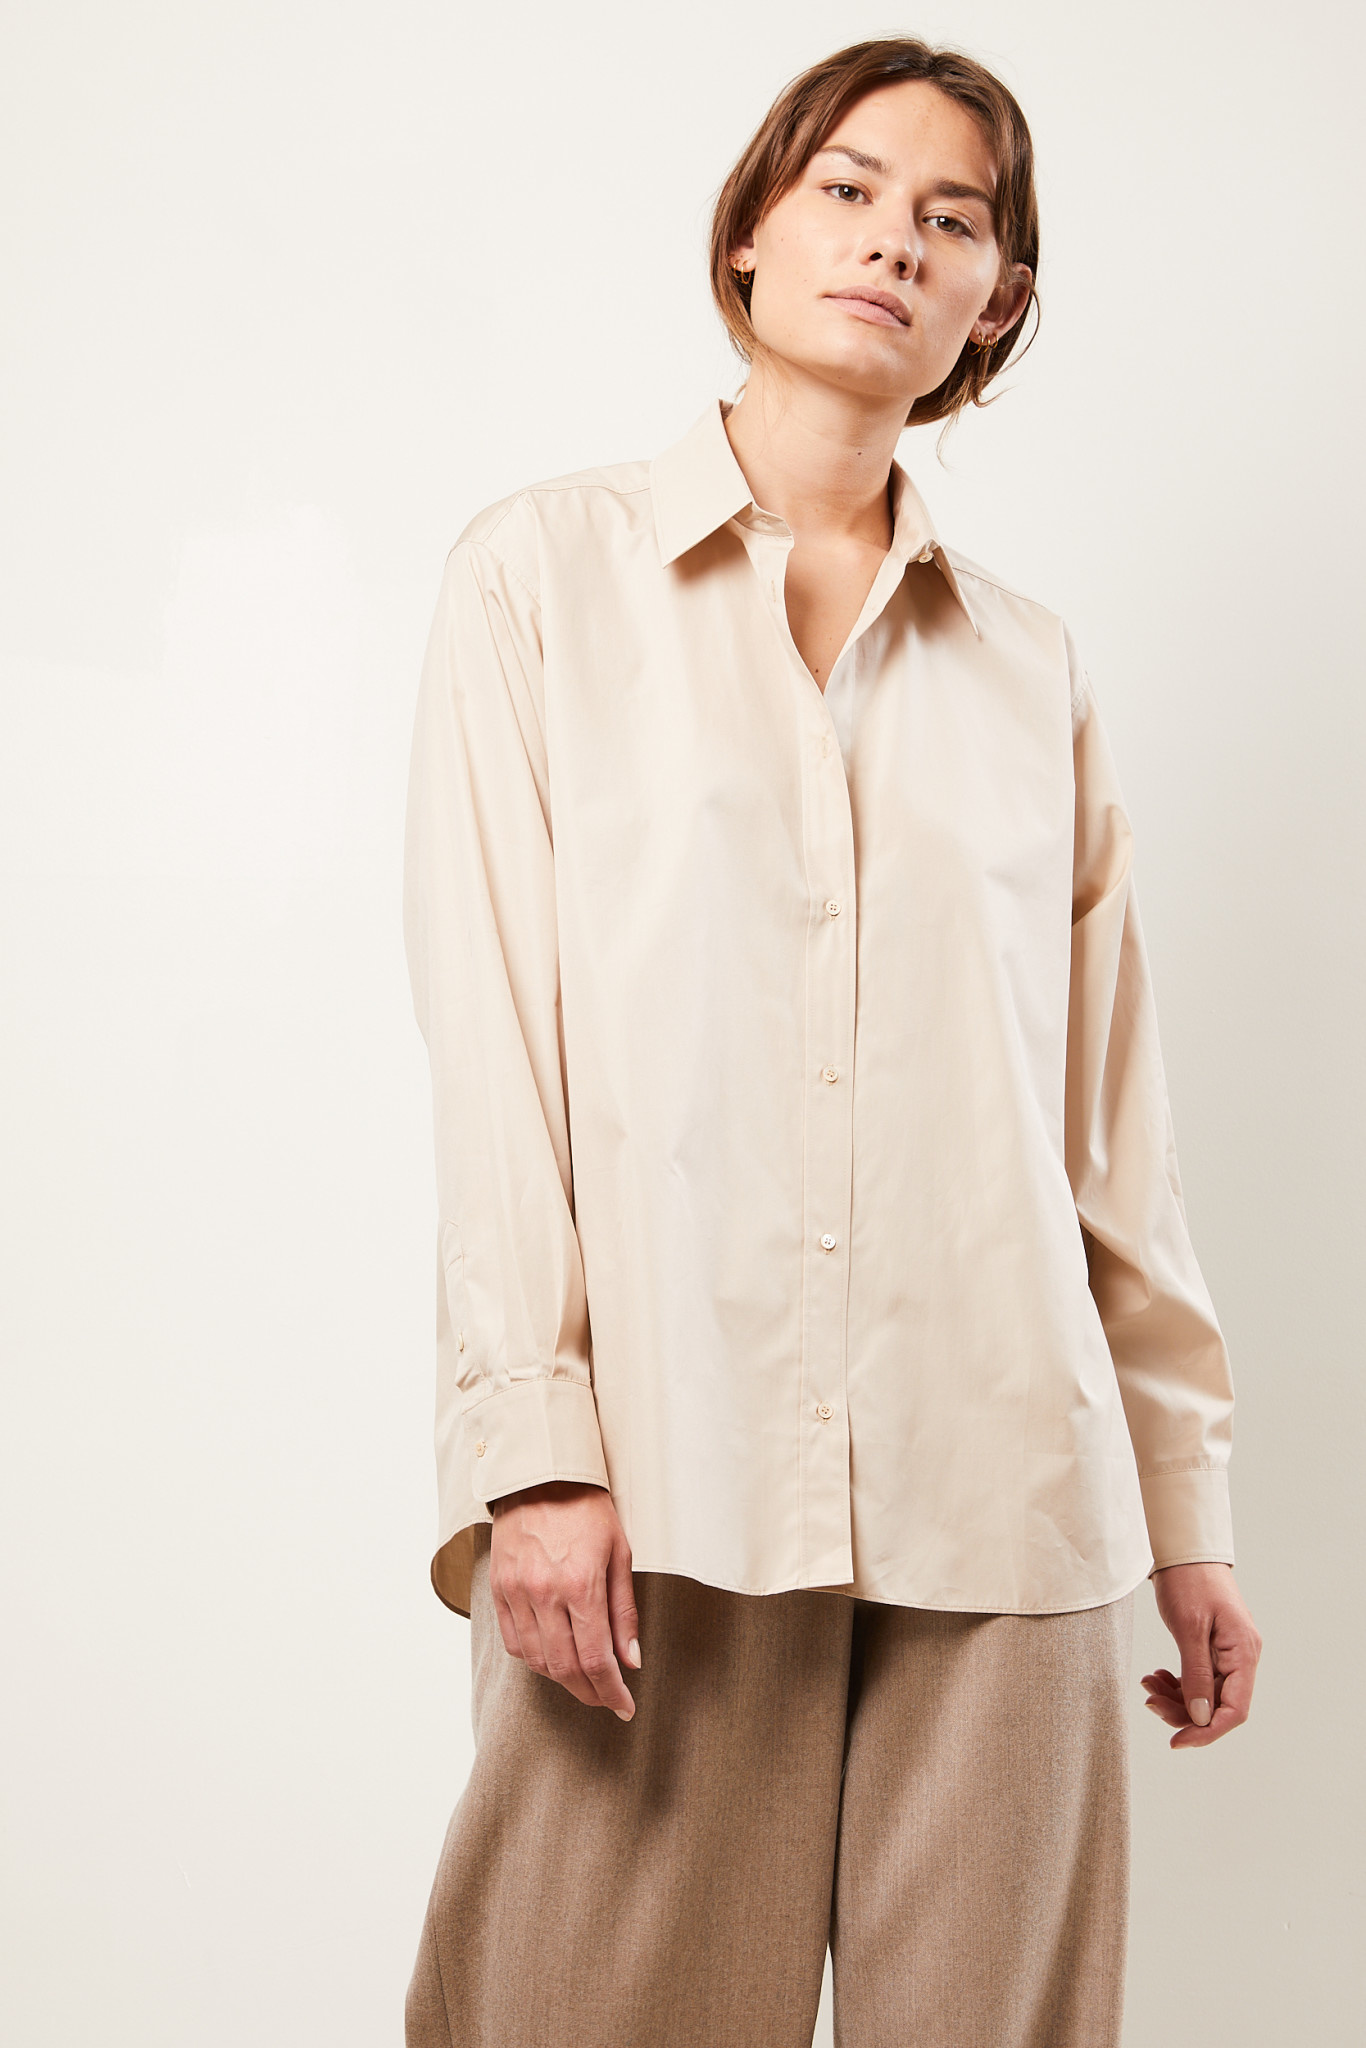 inDRESS Coriandre shirt